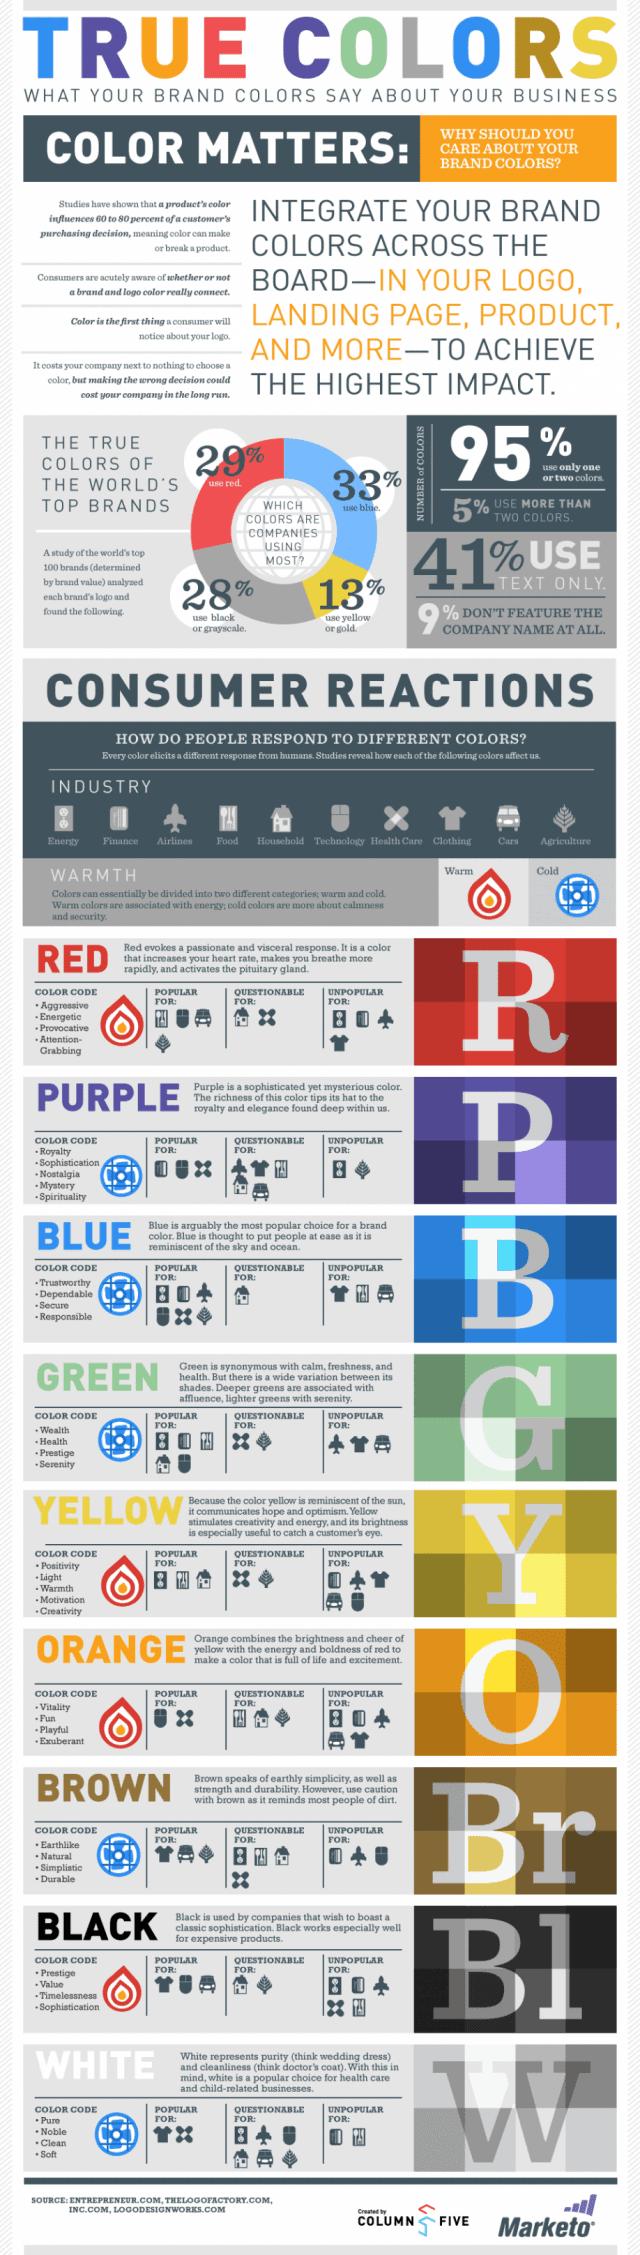 True Colors Branded Colors